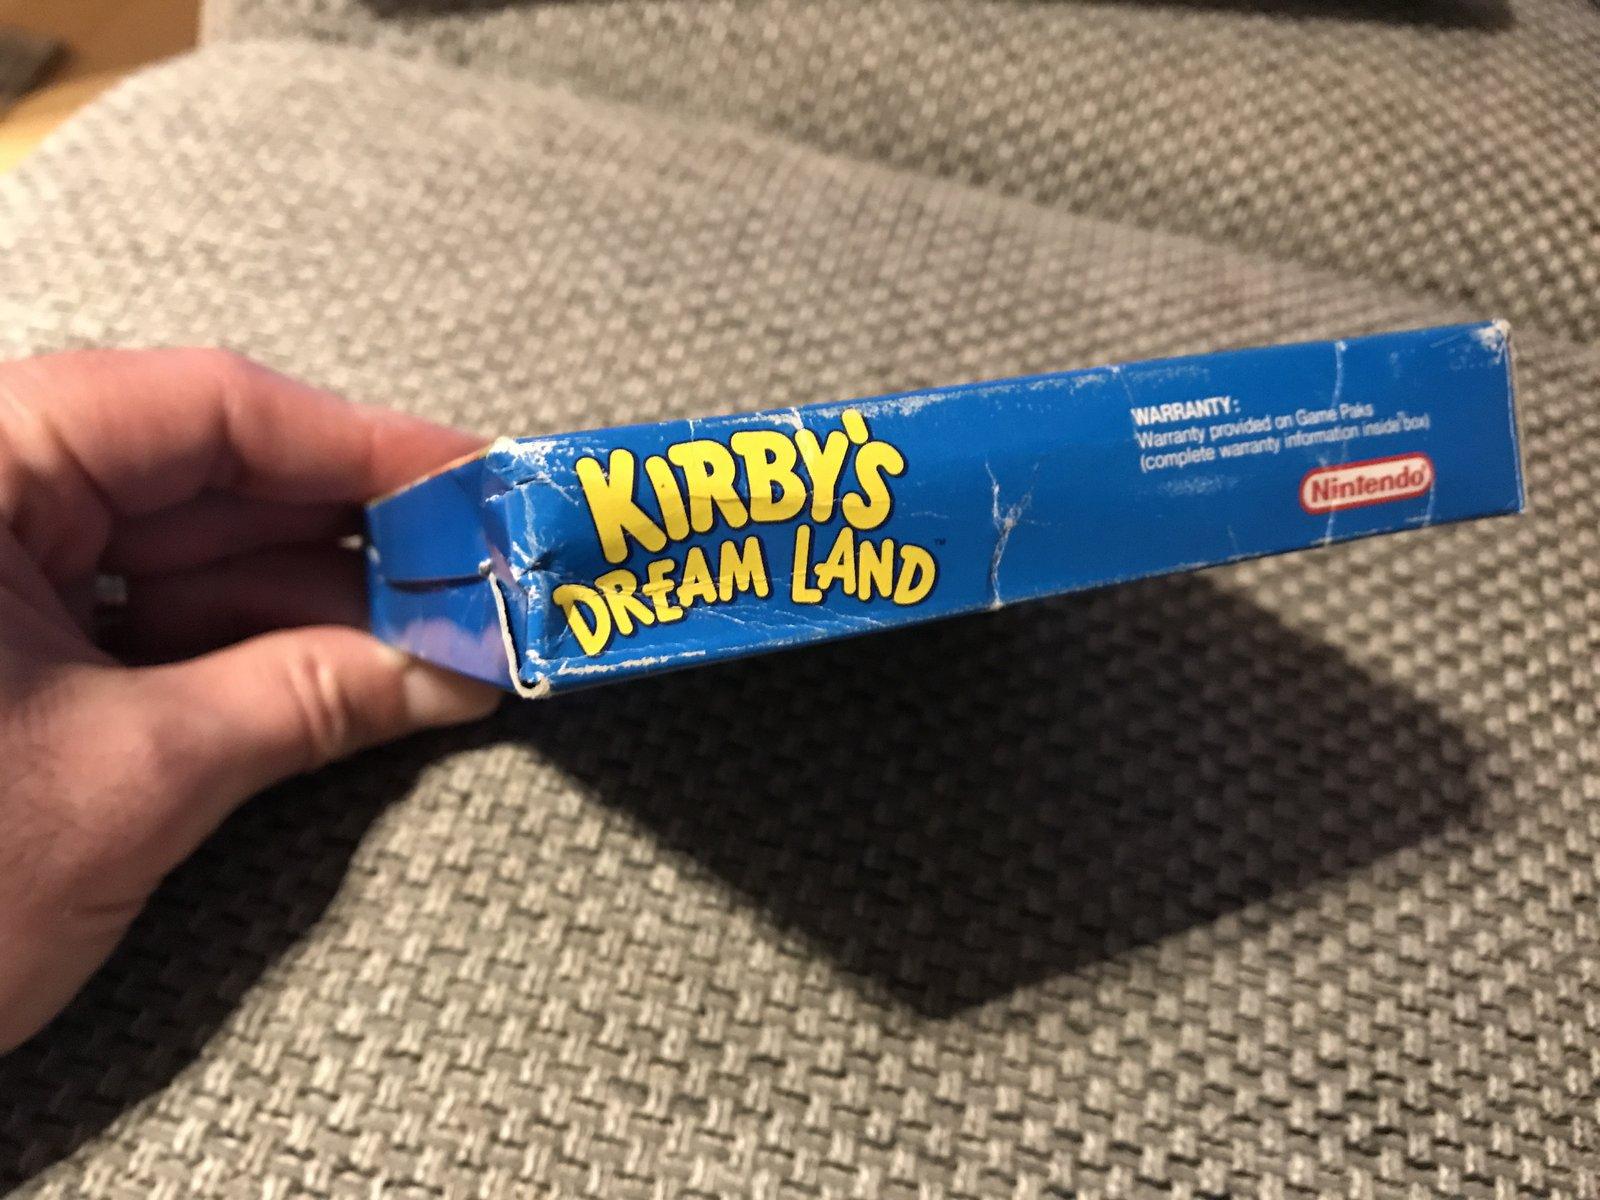 (VDS) Mystic Quest Game Boy + Kirby Dreamland 1 Game Boy 21010509464961117